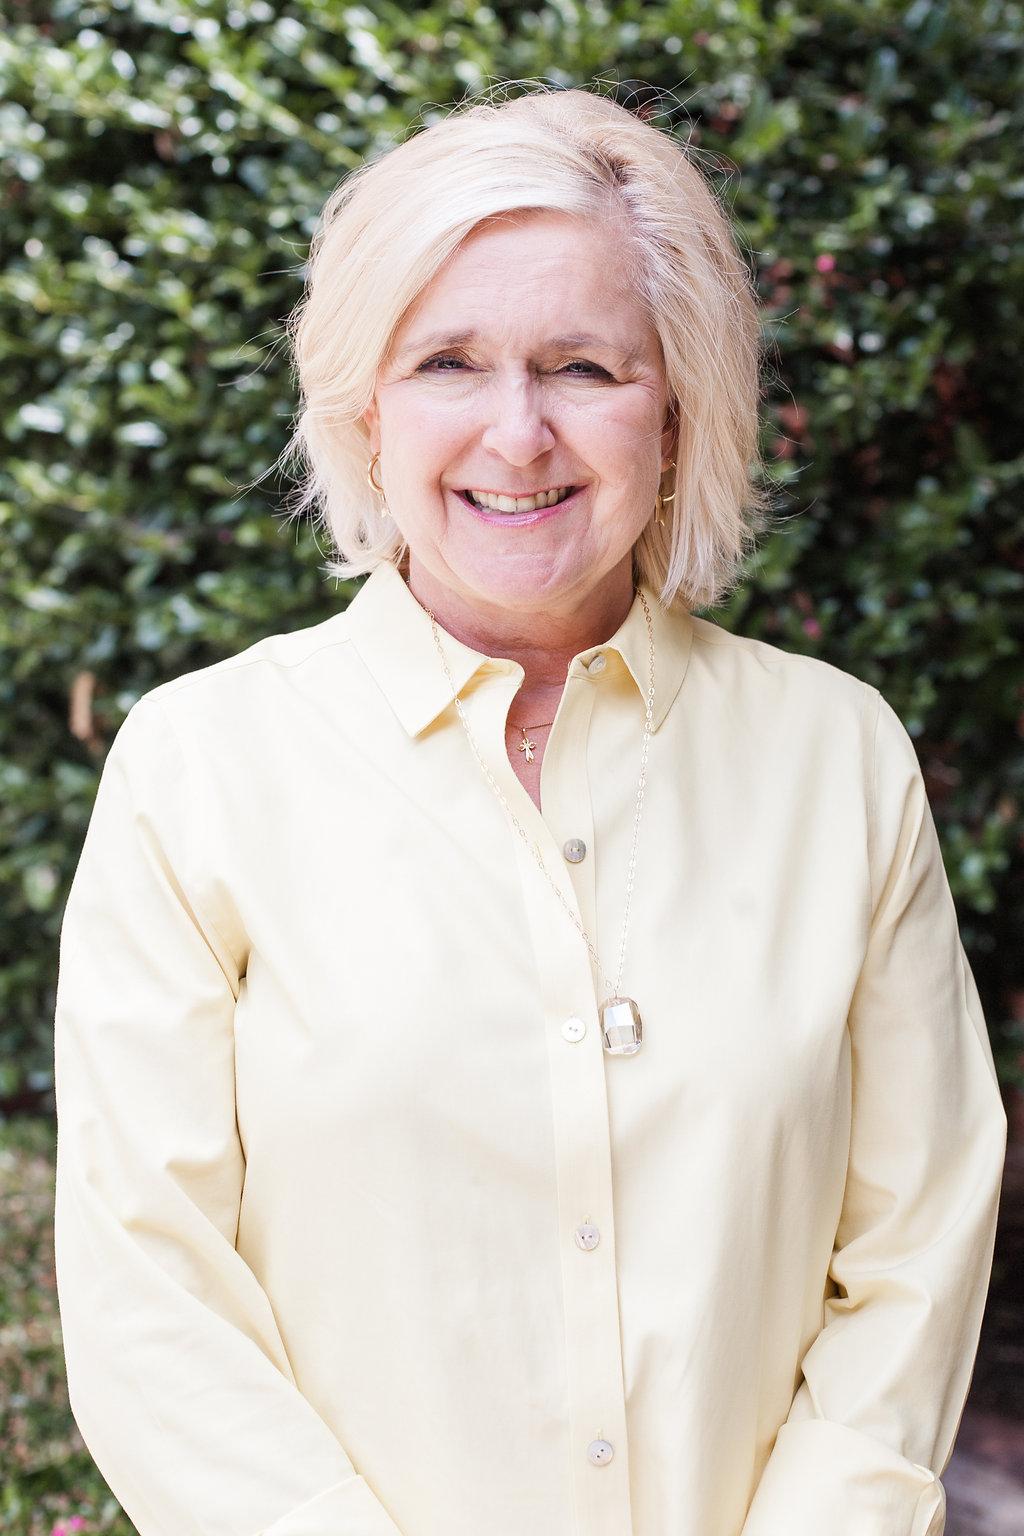 Lori Roden